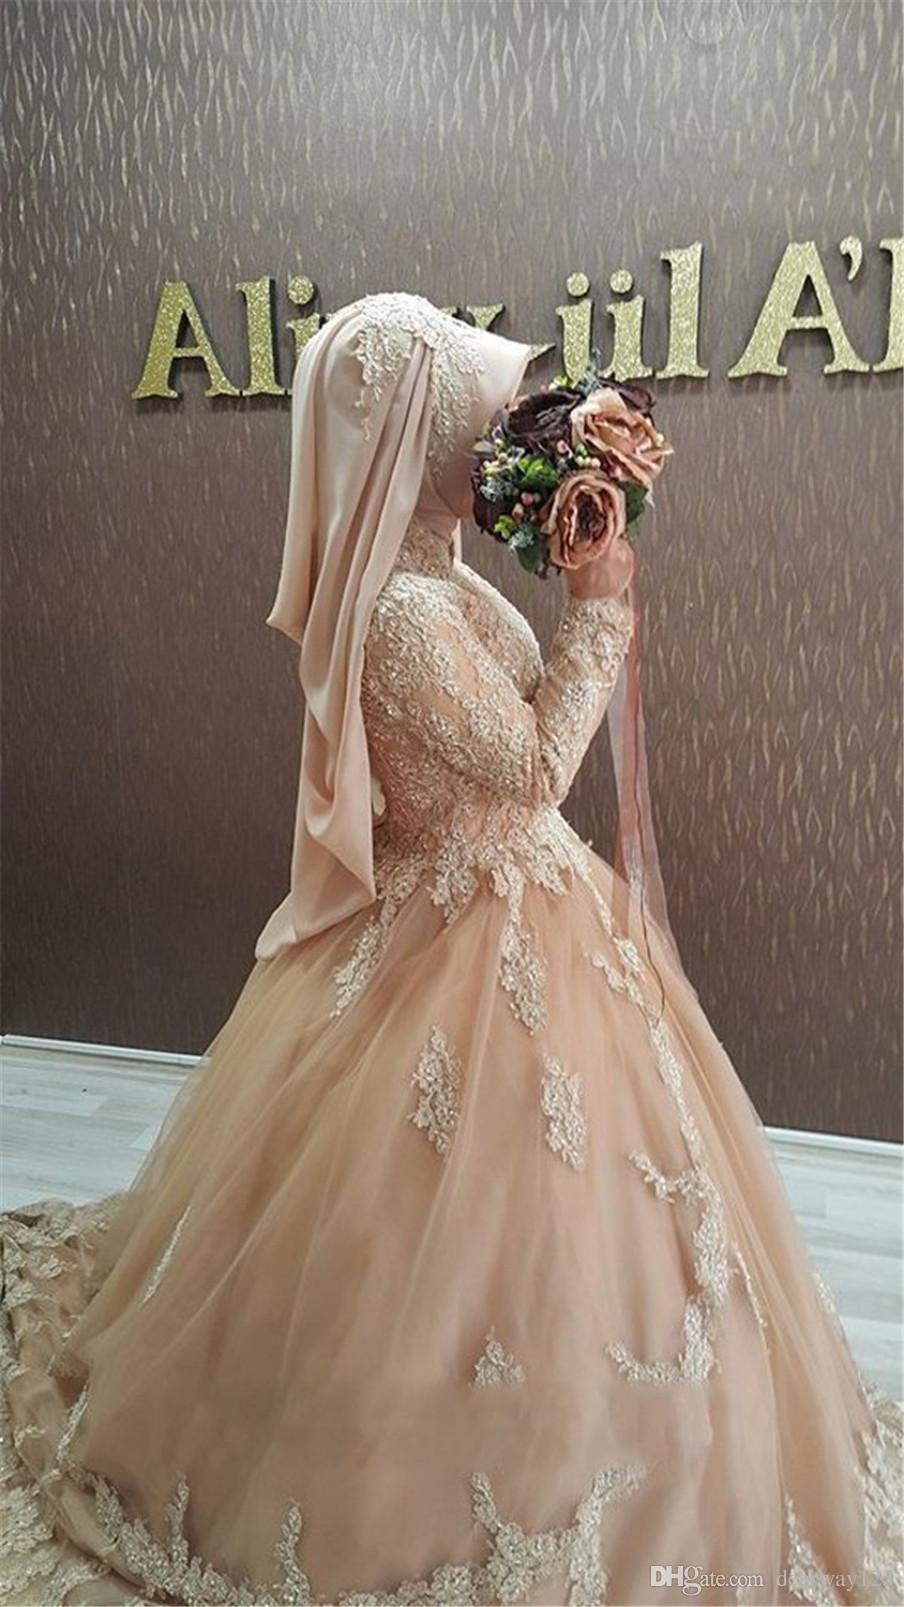 Vestido de novia de manga larga de encaje apliques Champagne alta escote boda musulmana islámica Vestidos Con Hihab Bata de mariage